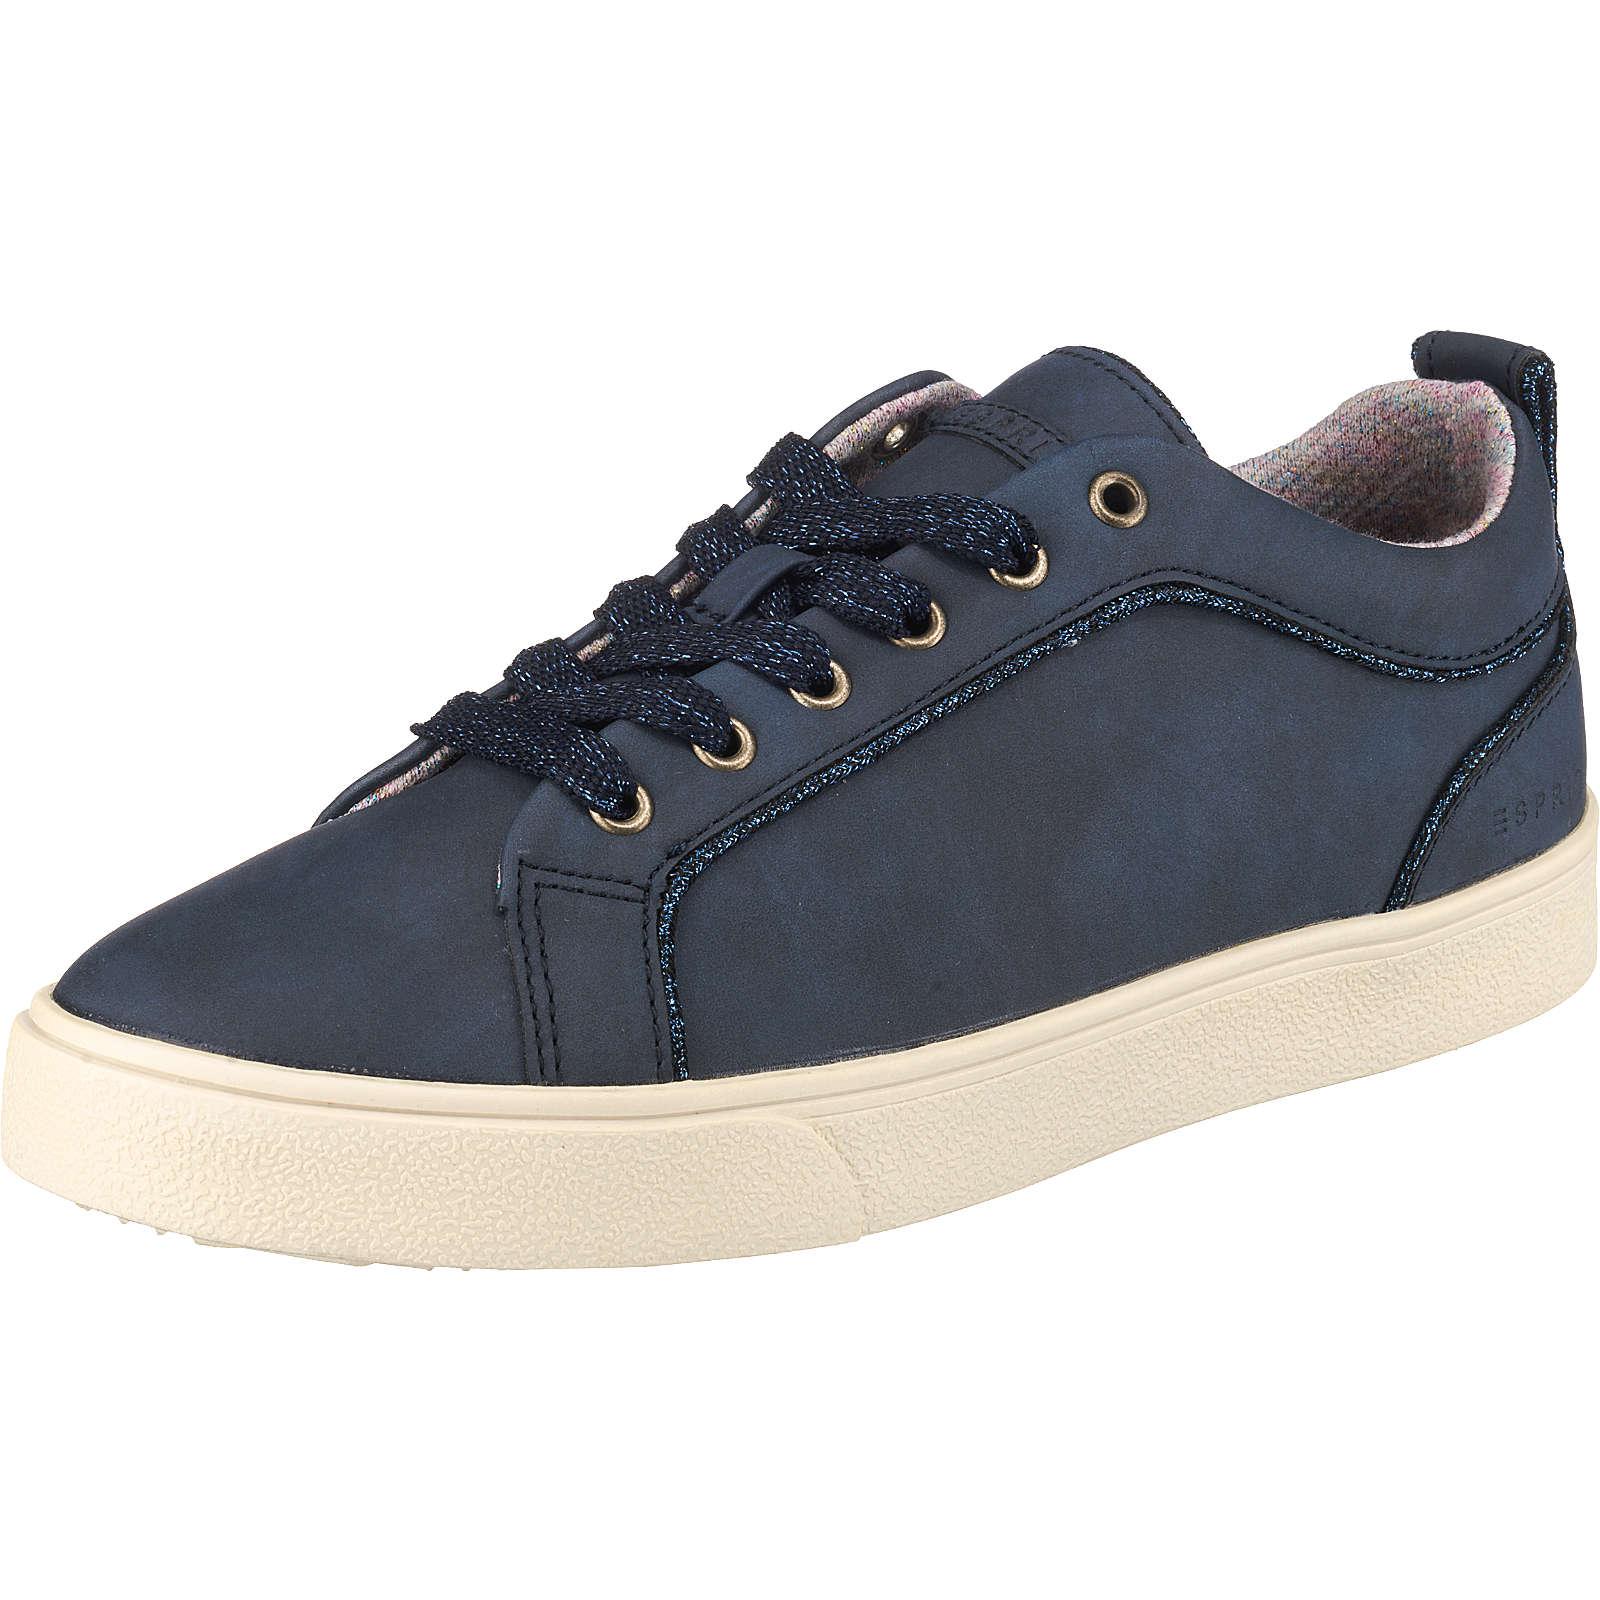 ESPRIT Cherry Sneakers Low dunkelblau Damen Gr. 36